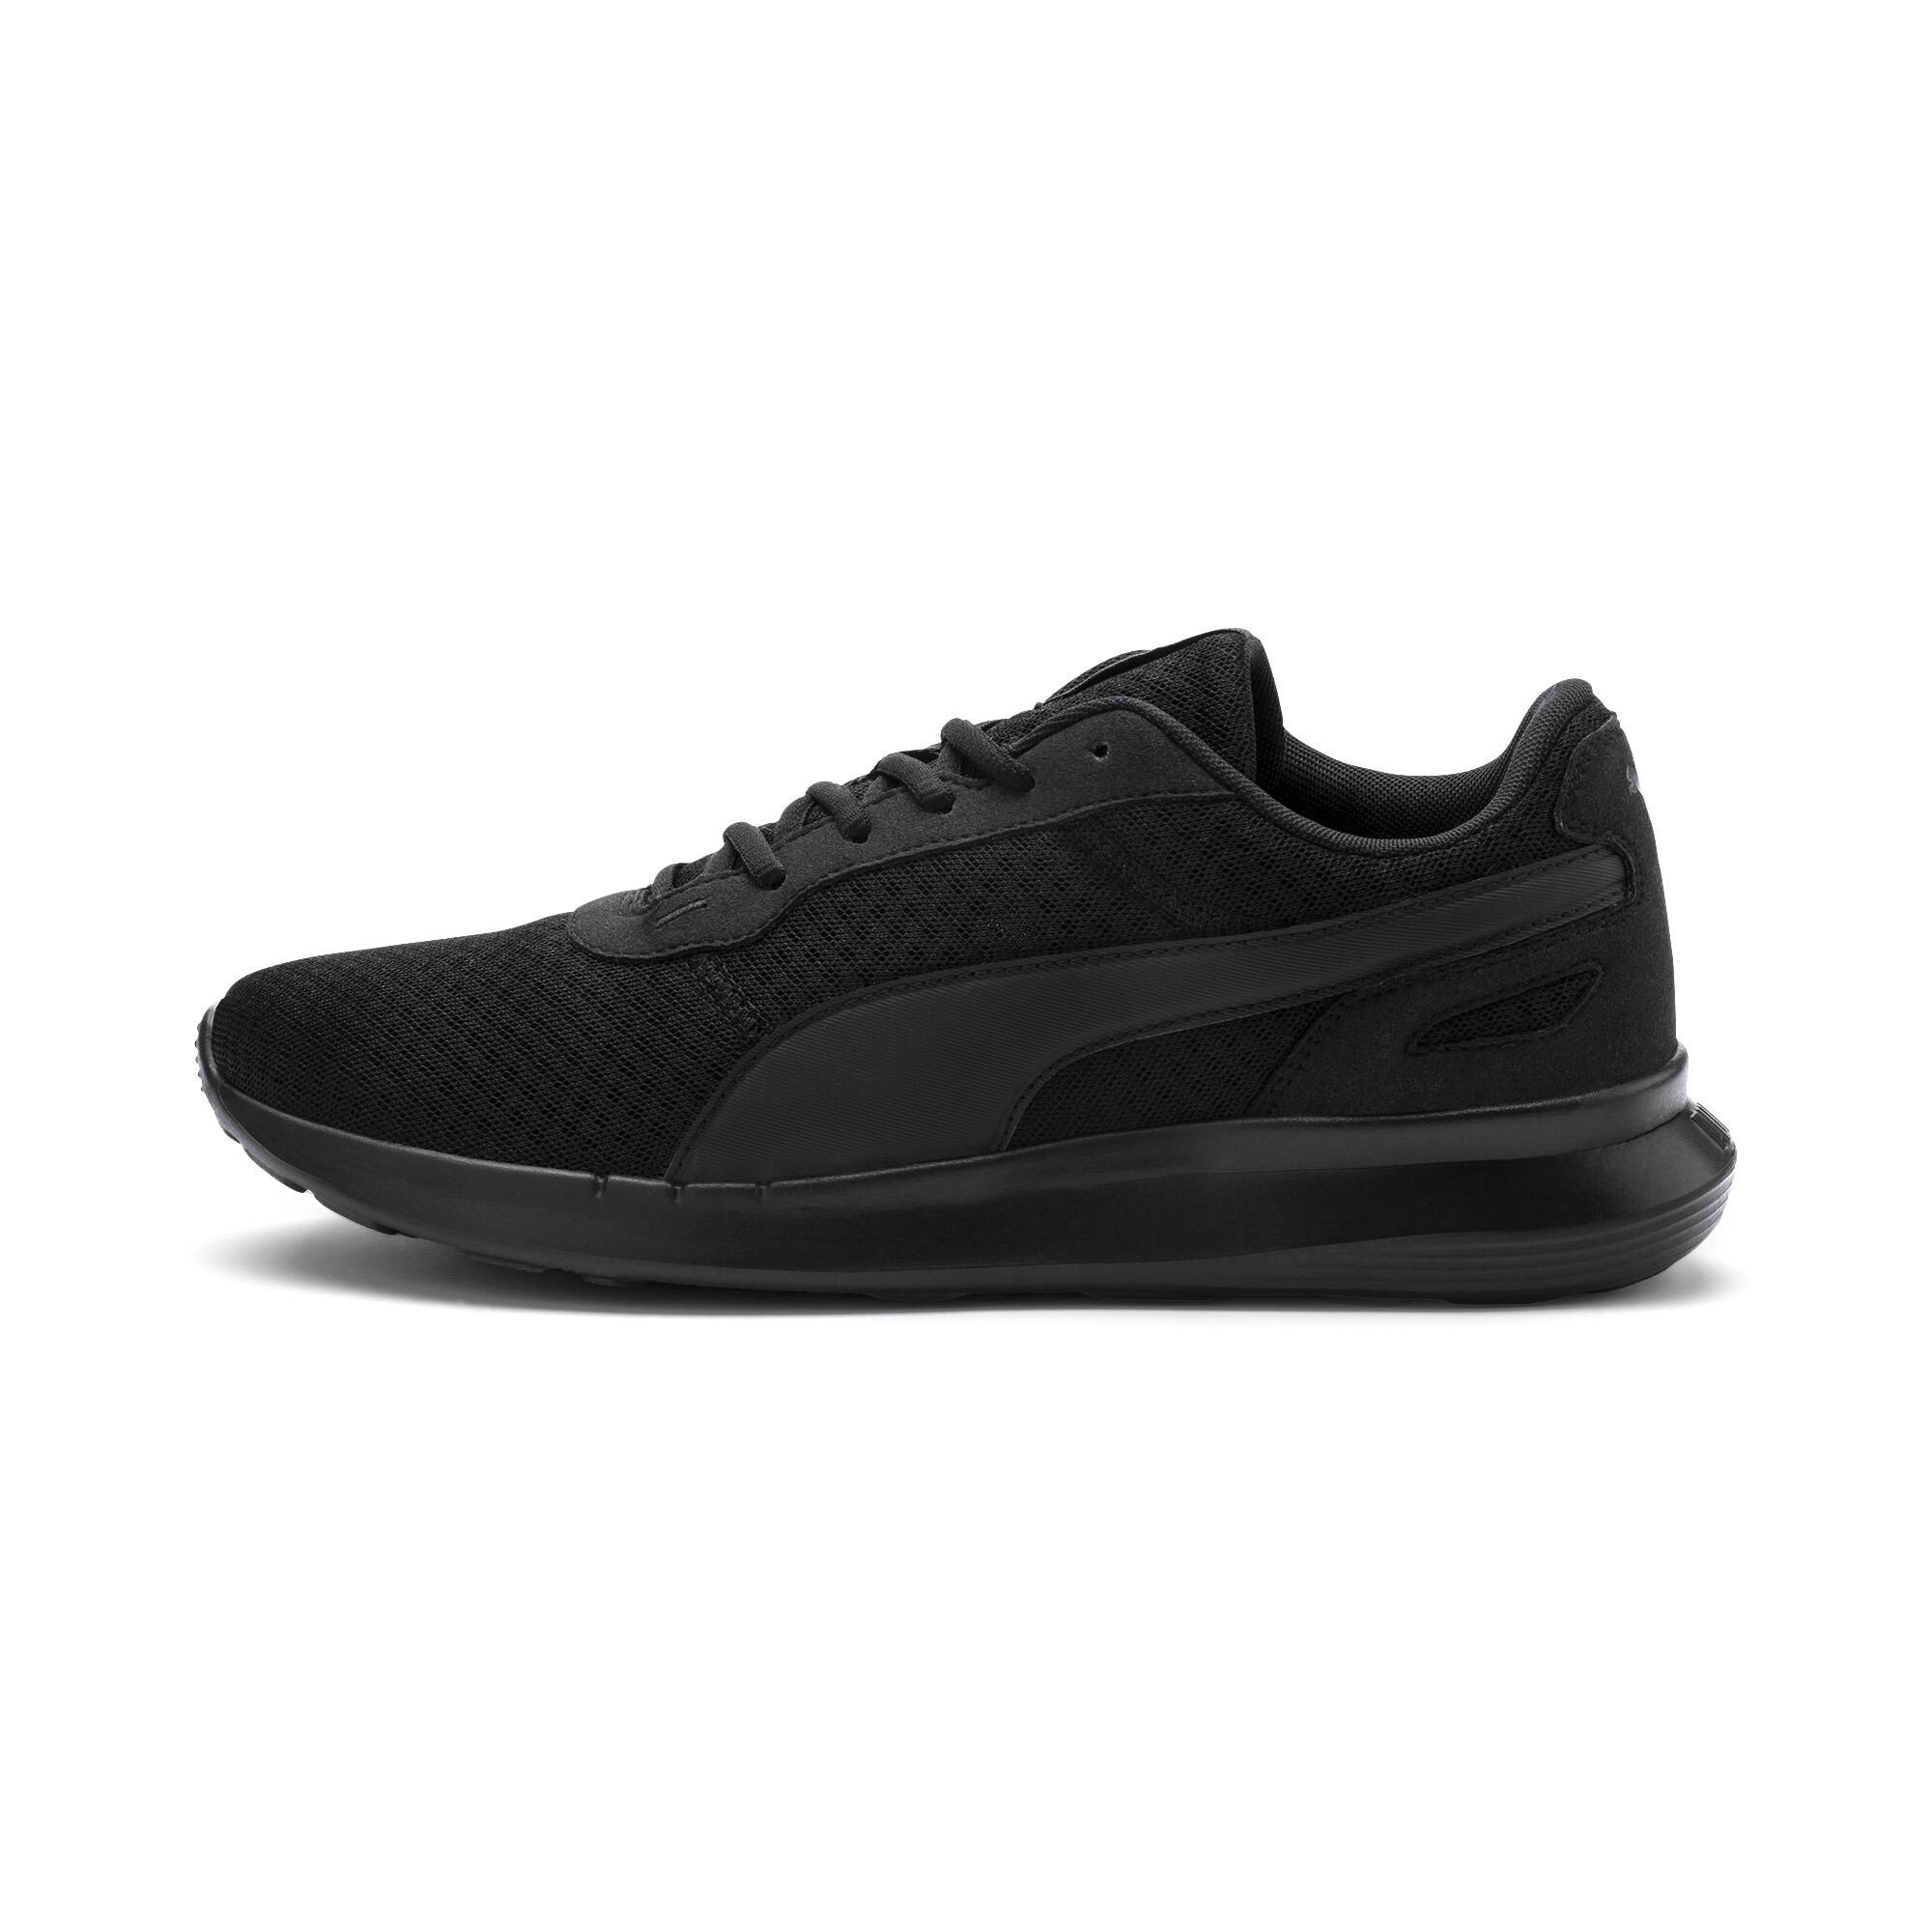 PUMA-Men-039-s-ST-Activate-Sneakers thumbnail 4